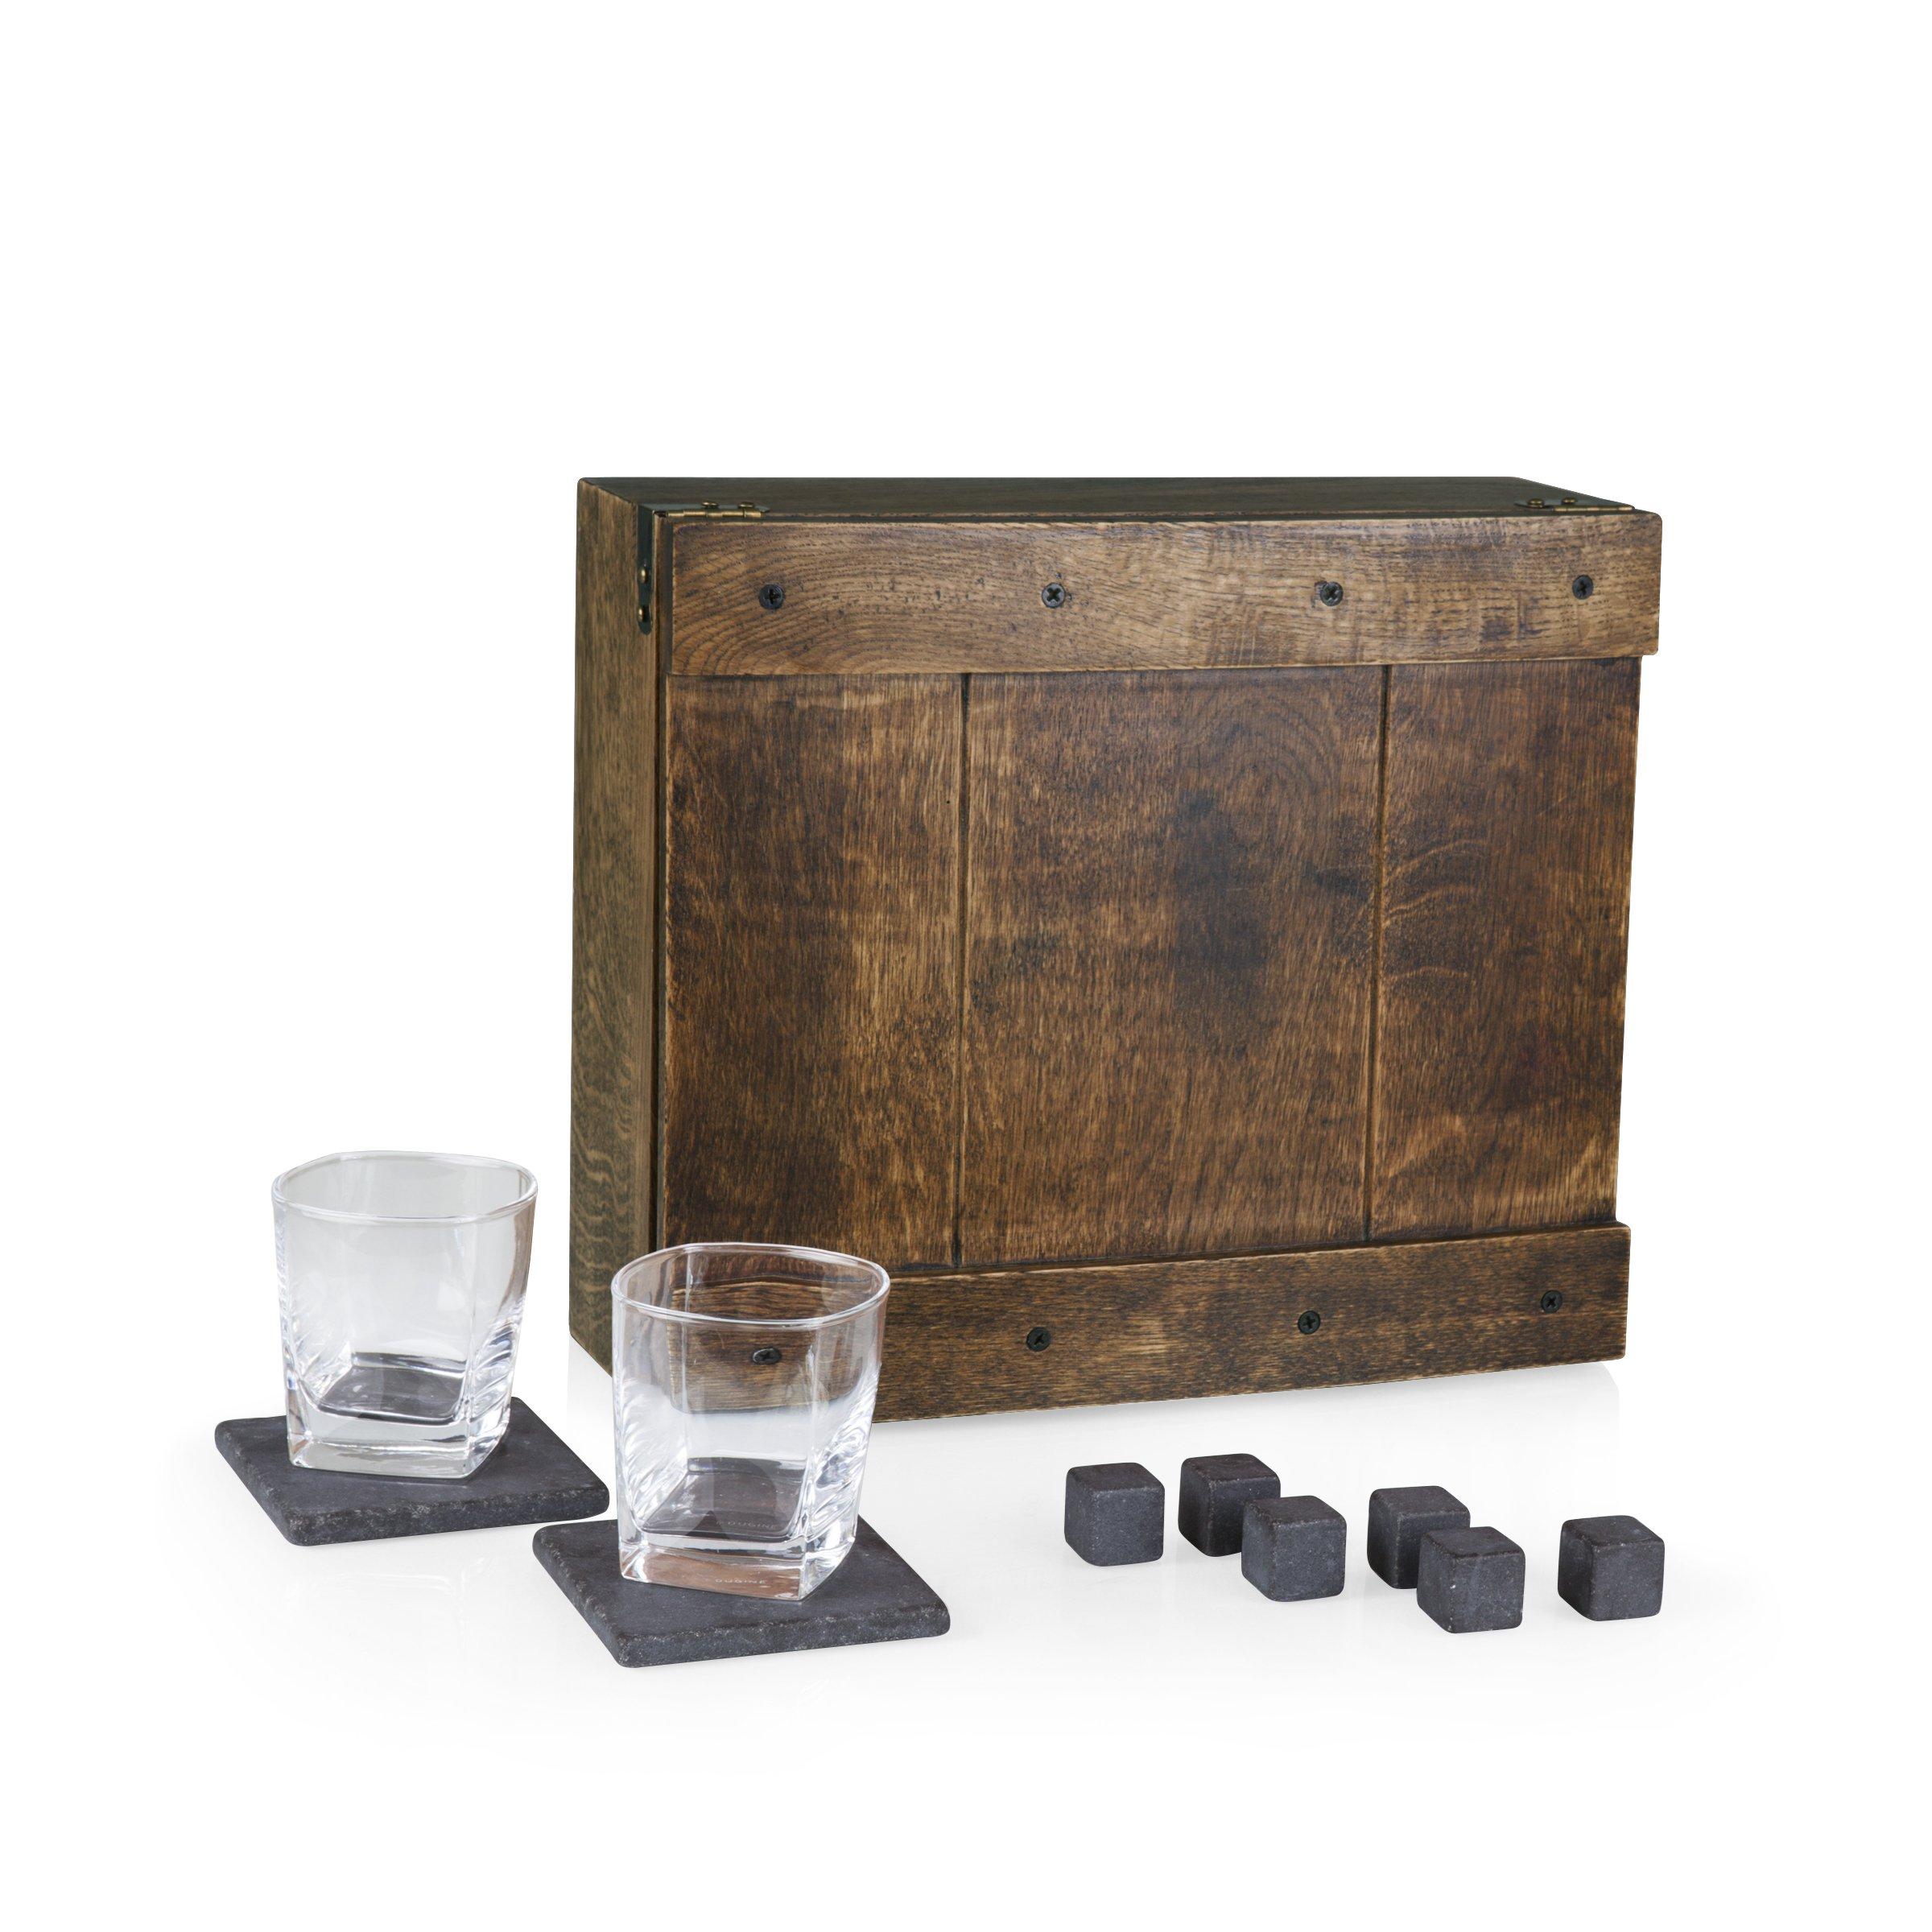 LEGACY - a Picnic Time Brand Whiskey Box Gift Set with Service for Two by LEGACY - a Picnic Time Brand